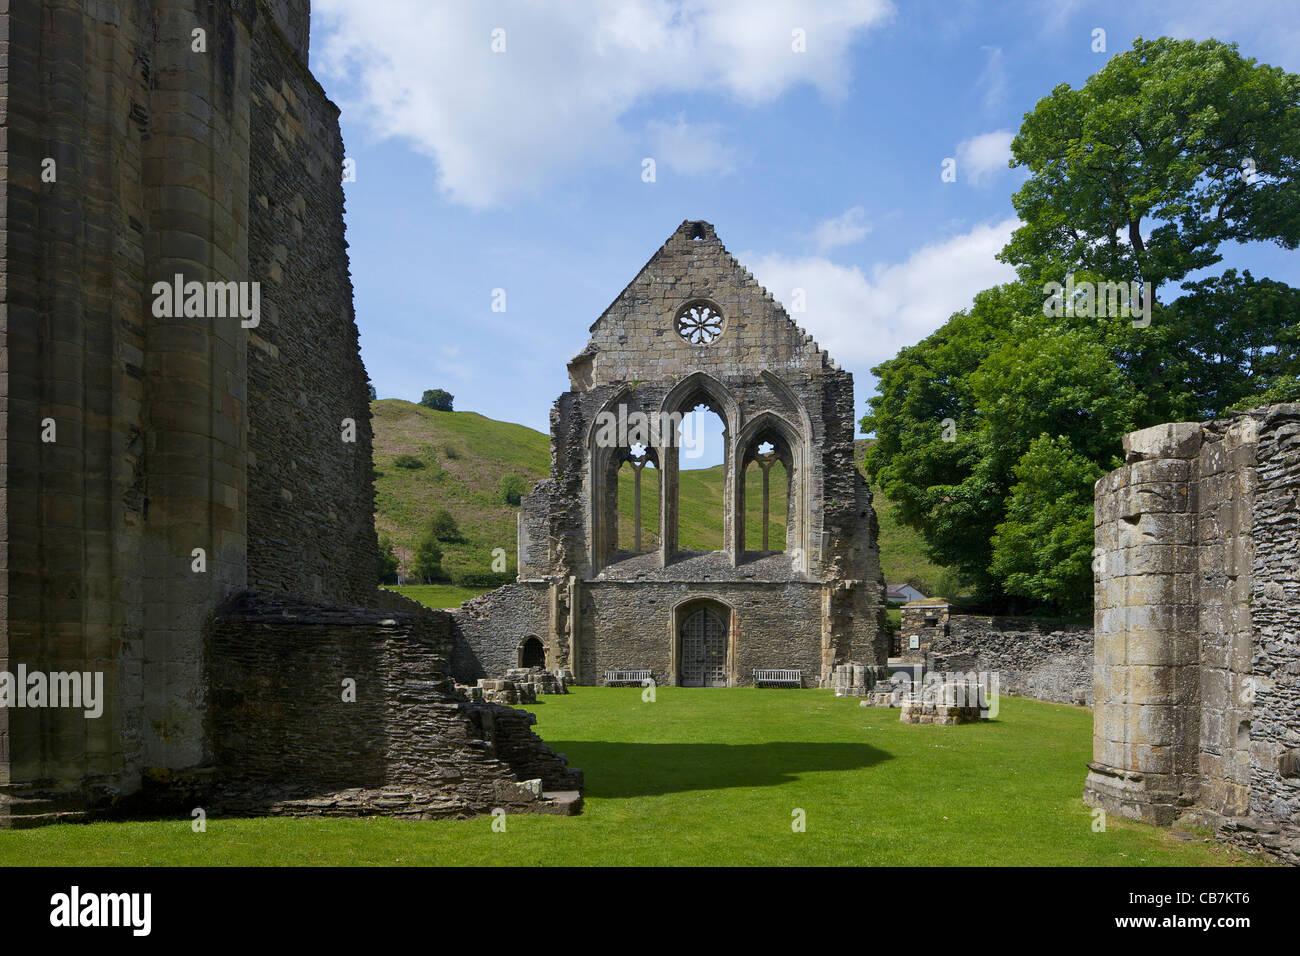 Valle Crucis ruined Cistercian abbey in Llantysilio, near Llangollen, Wales, Cymru, UK, United Kingdom, Stock Photo